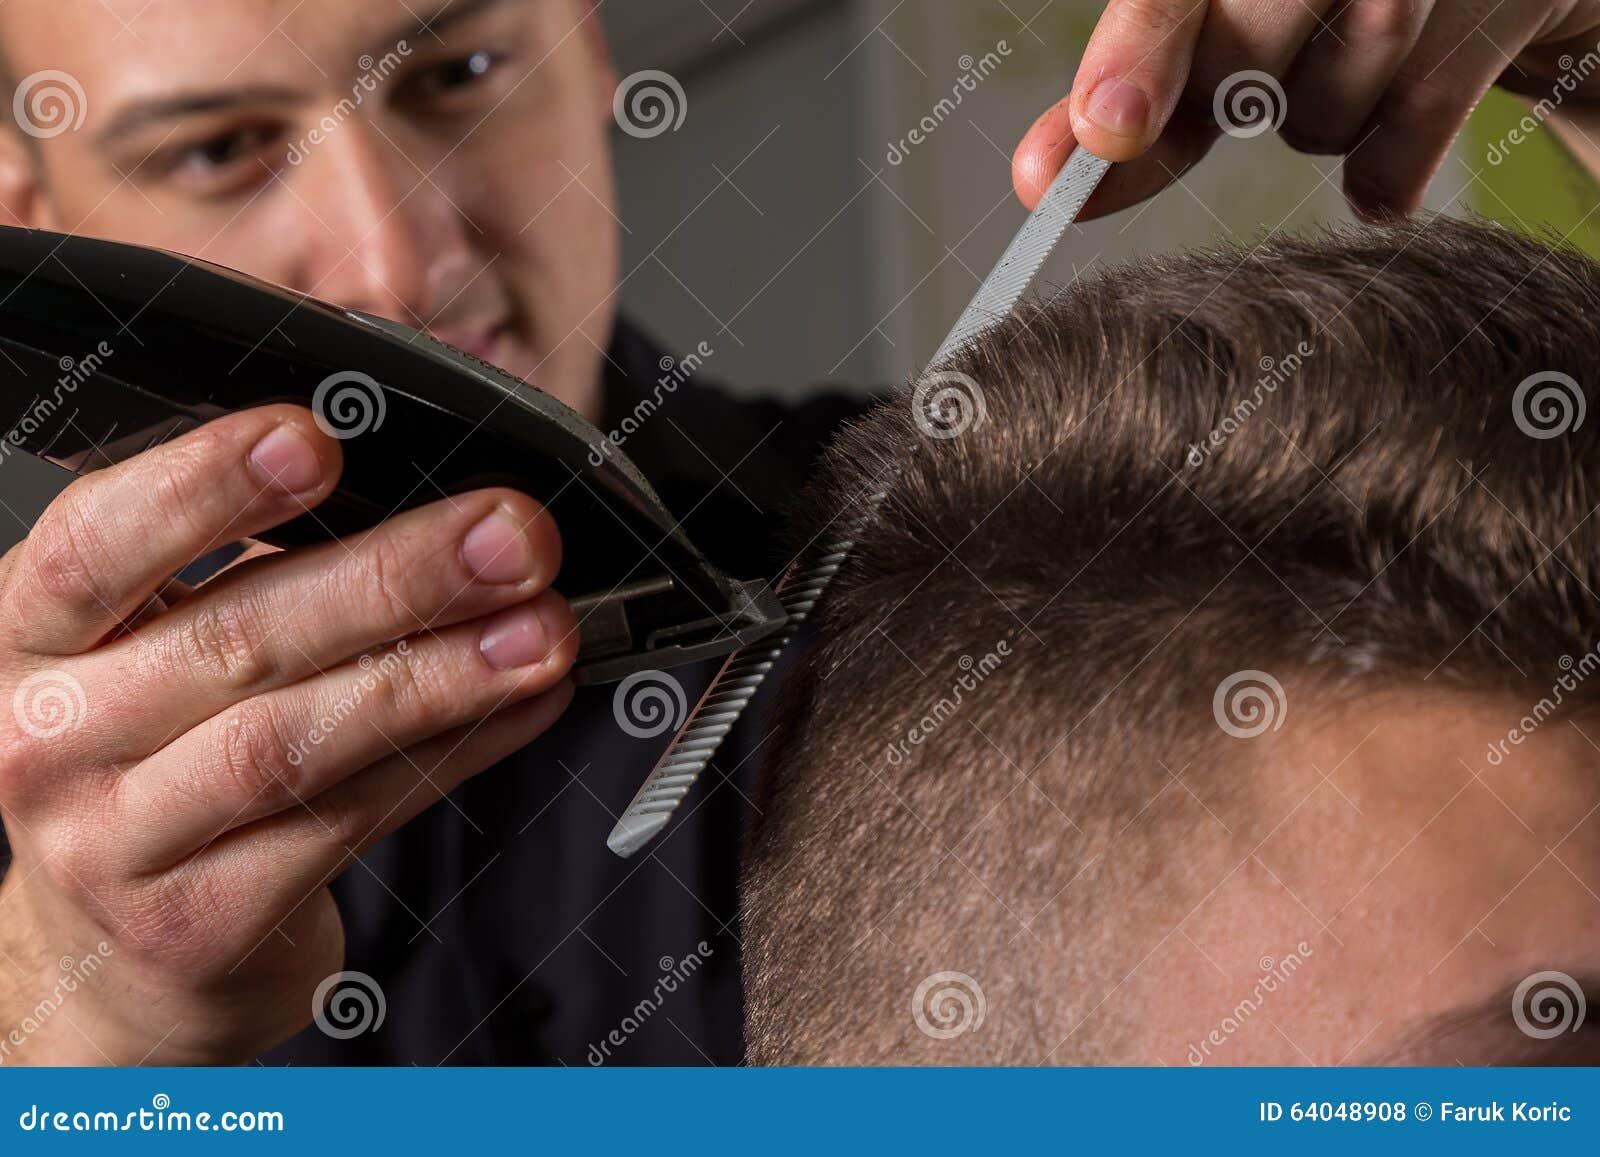 Hairdresser cutting clients hair with an electric hair clipper